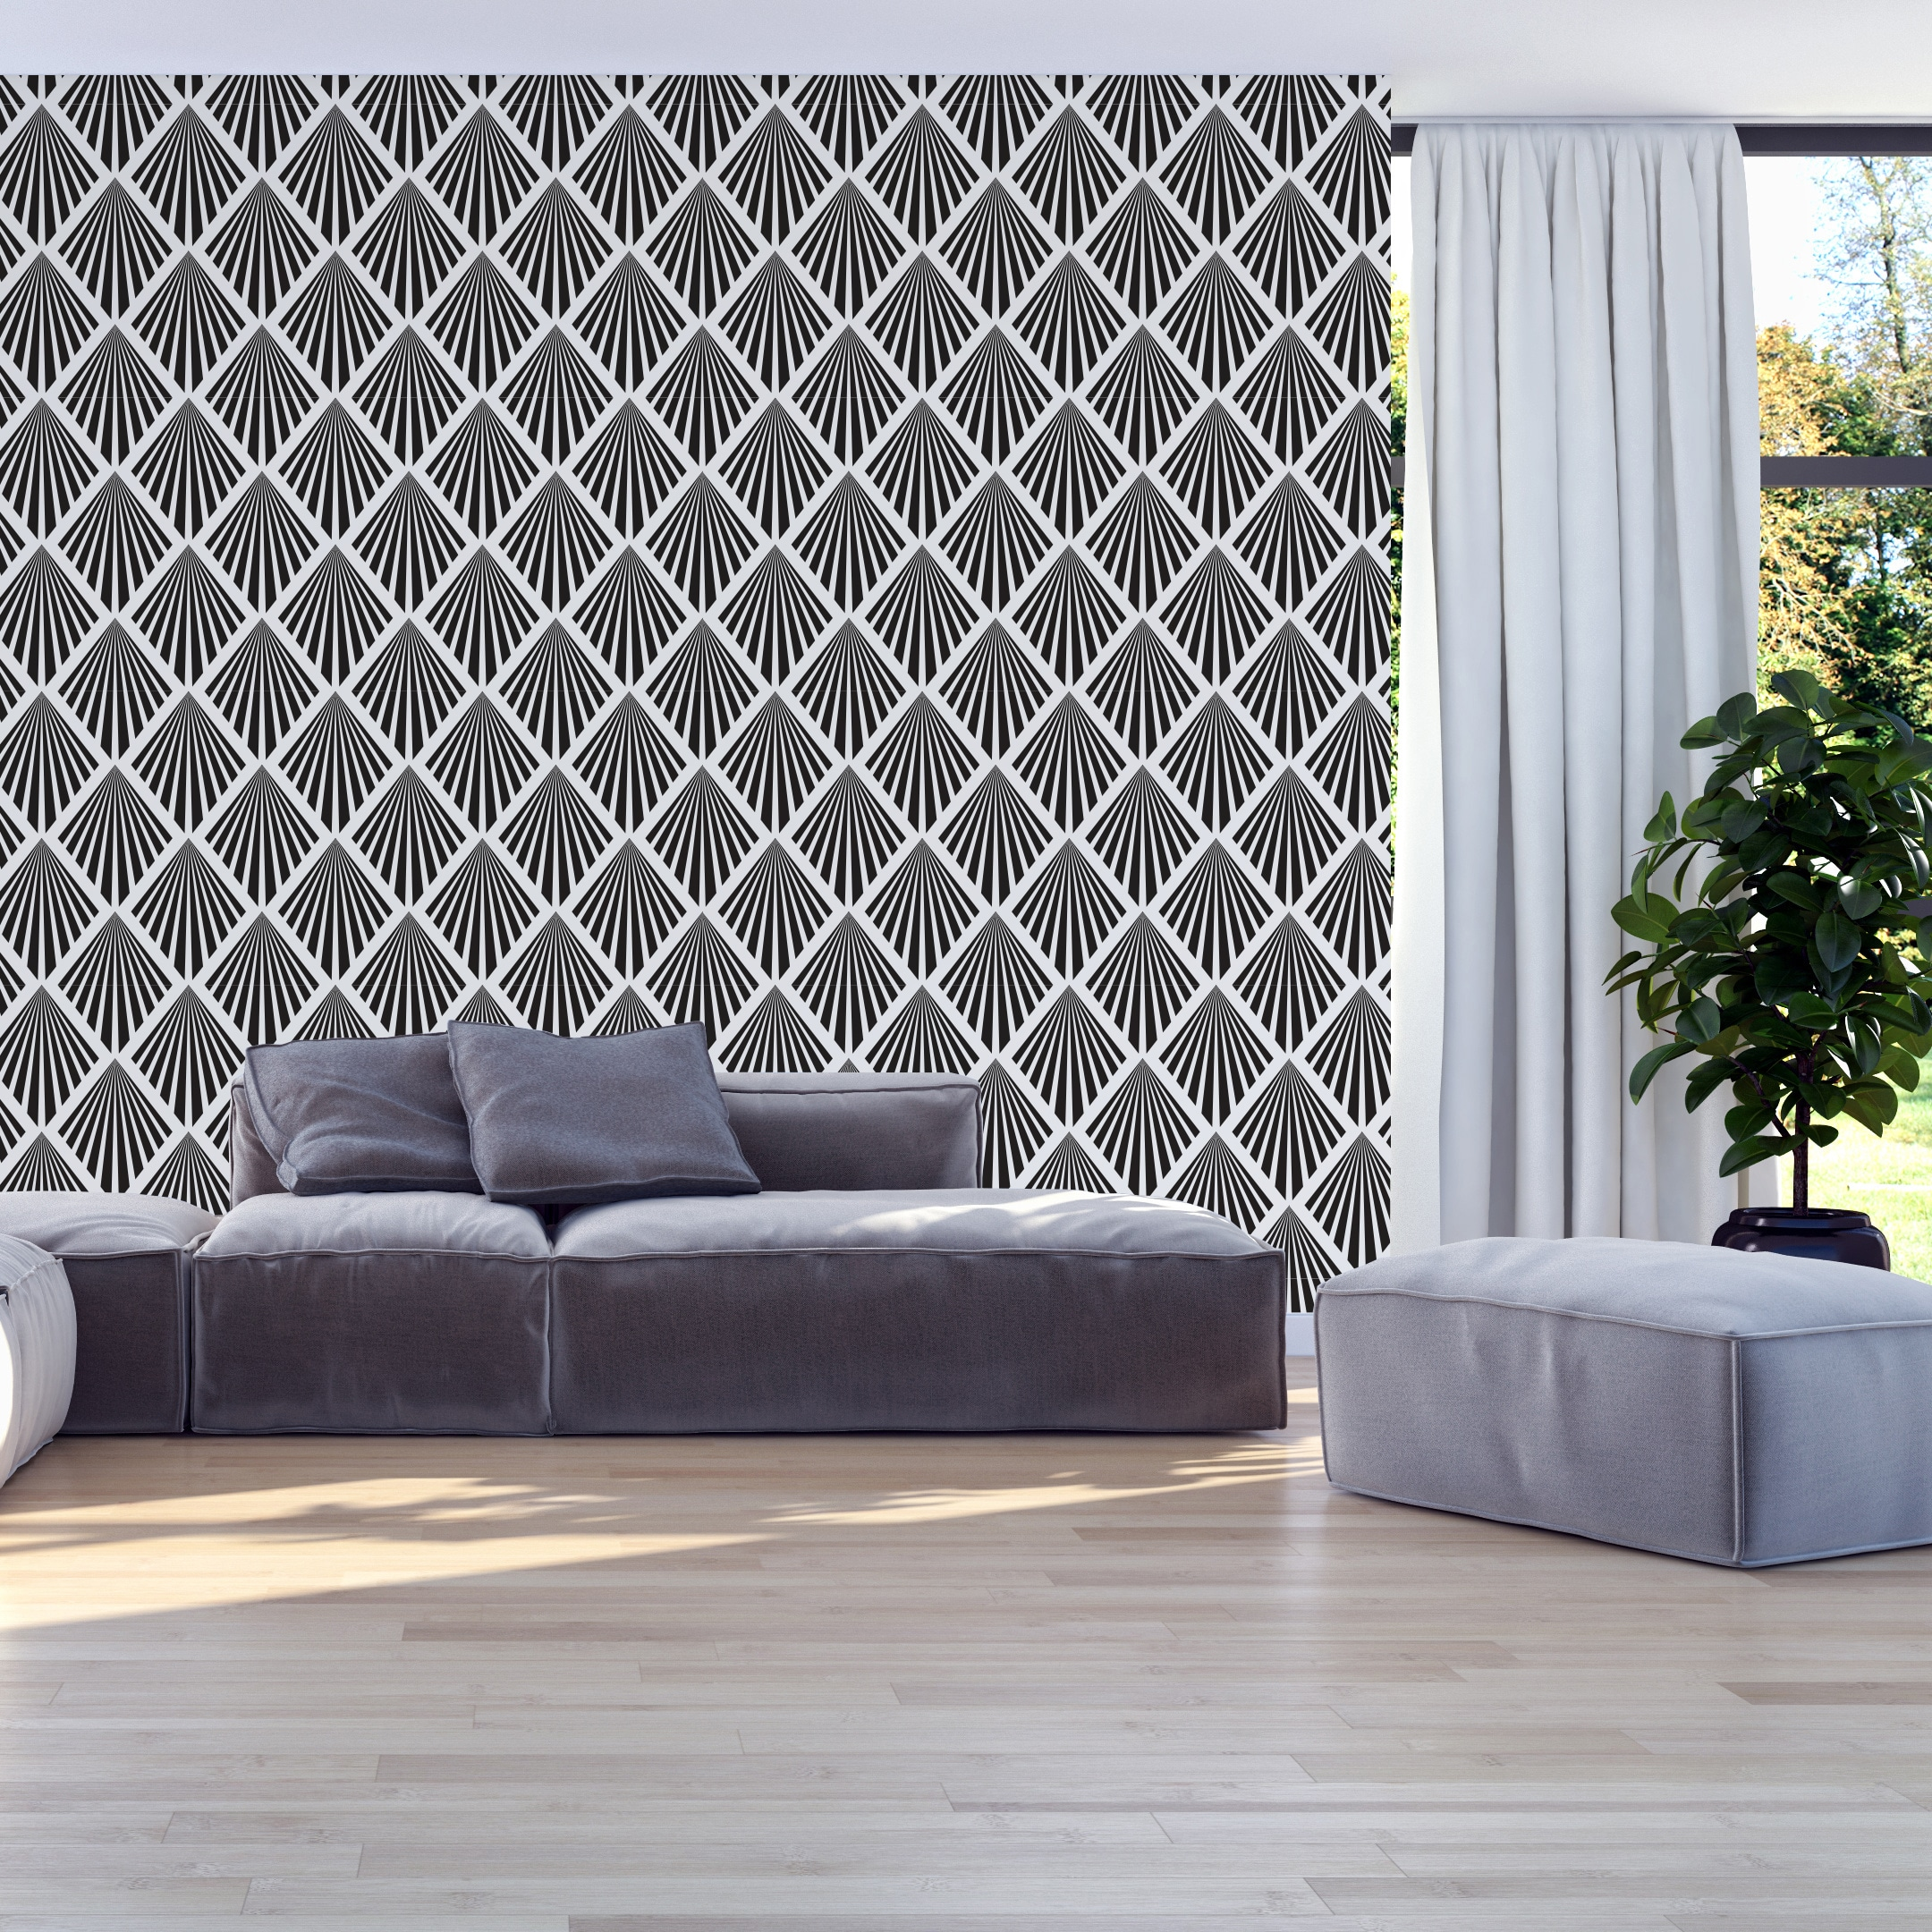 Removable Wallpaper SKU:ADLV Wallpaper Art Deco Pattern Art Deco Leaves Pattern Printed Wall Art